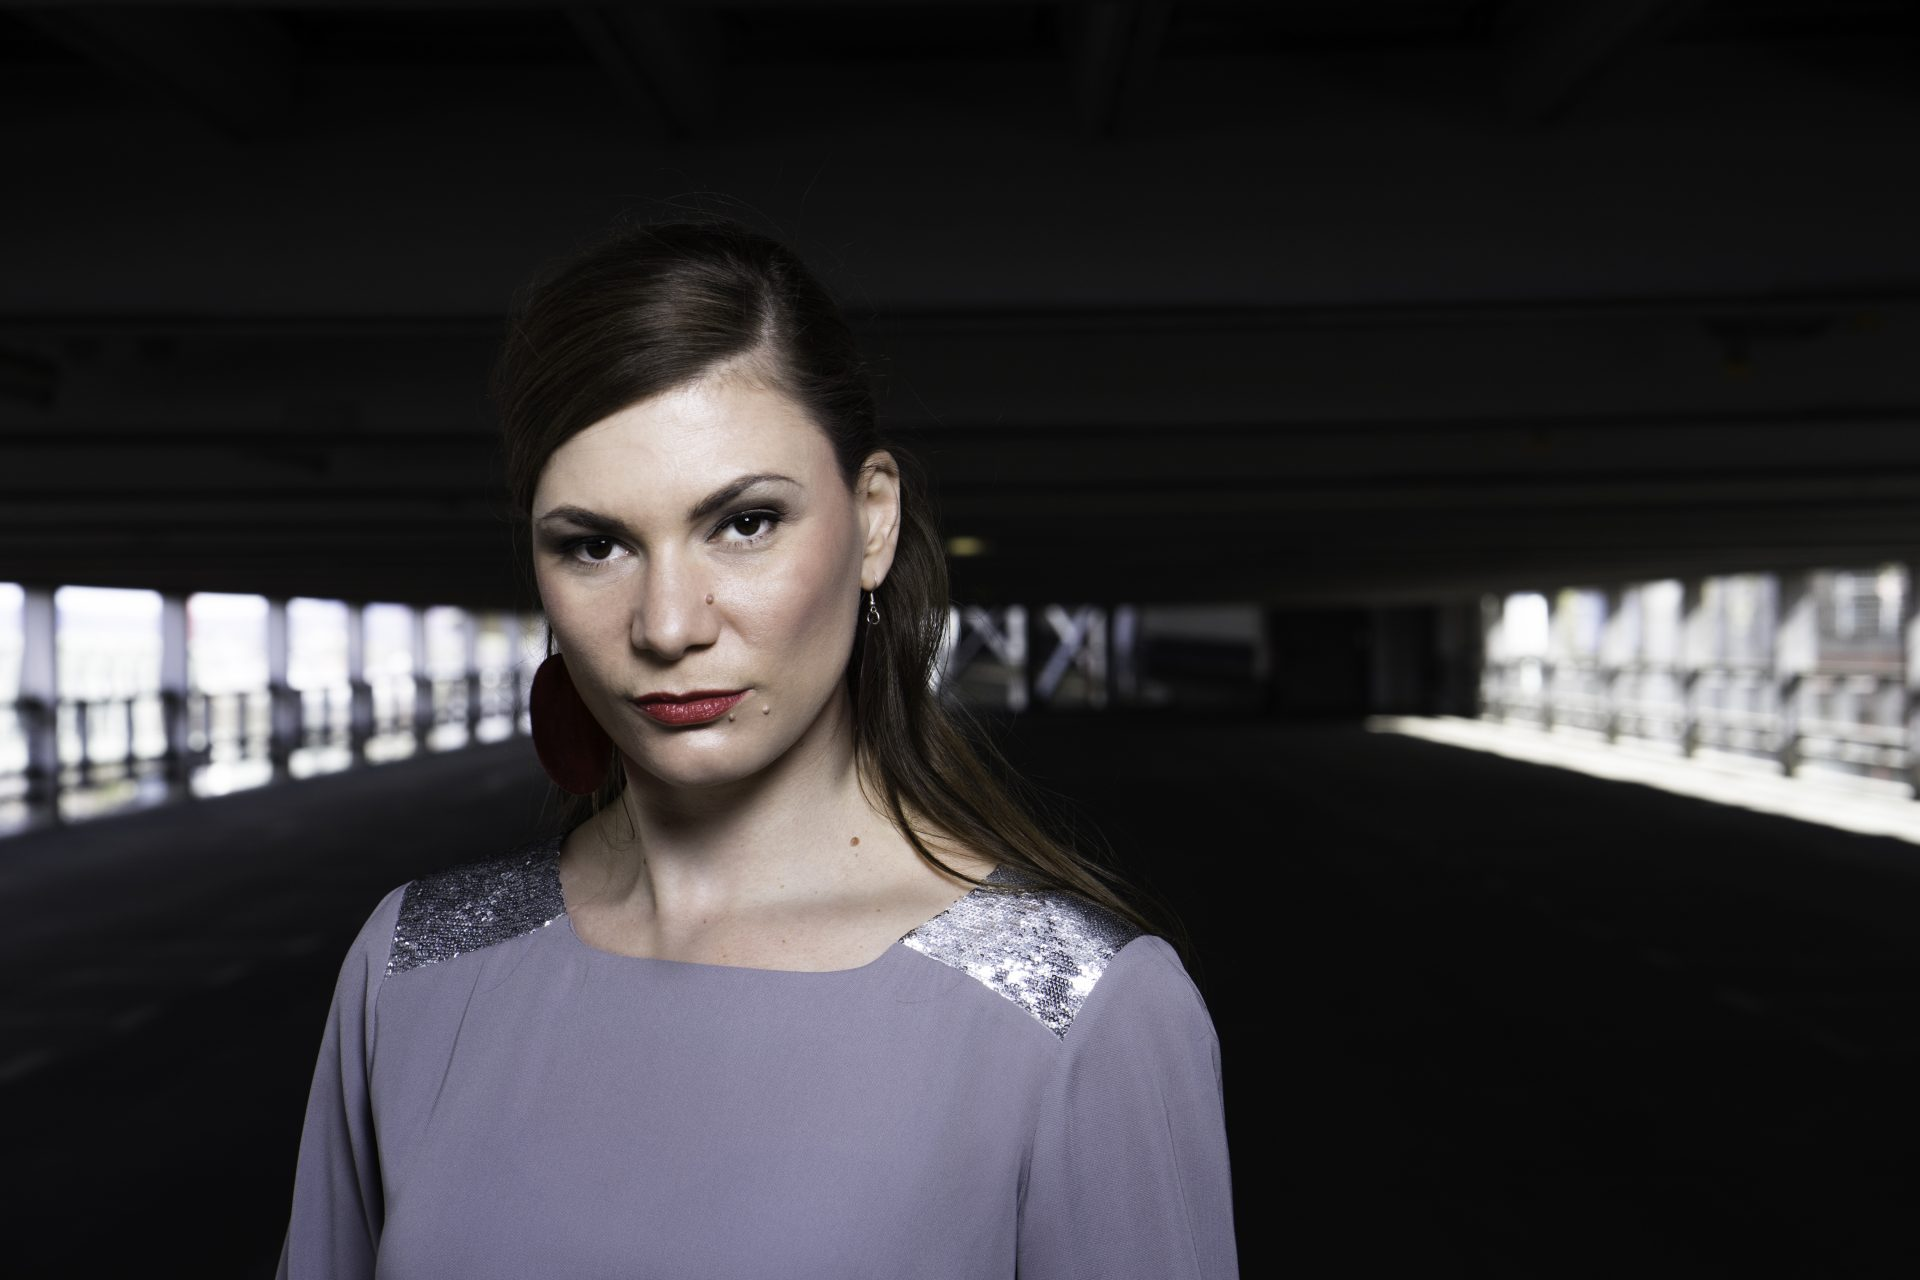 Sängerin Schauspielerin Bonn